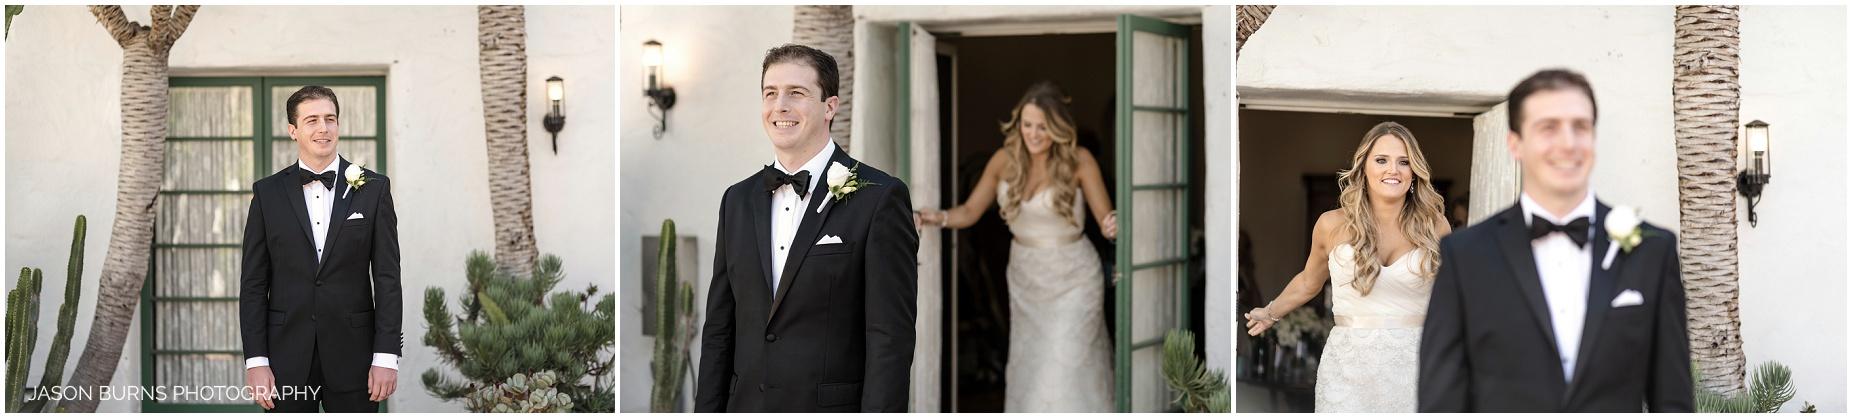 casa-romantica-wedding-san-clemente-ca-15